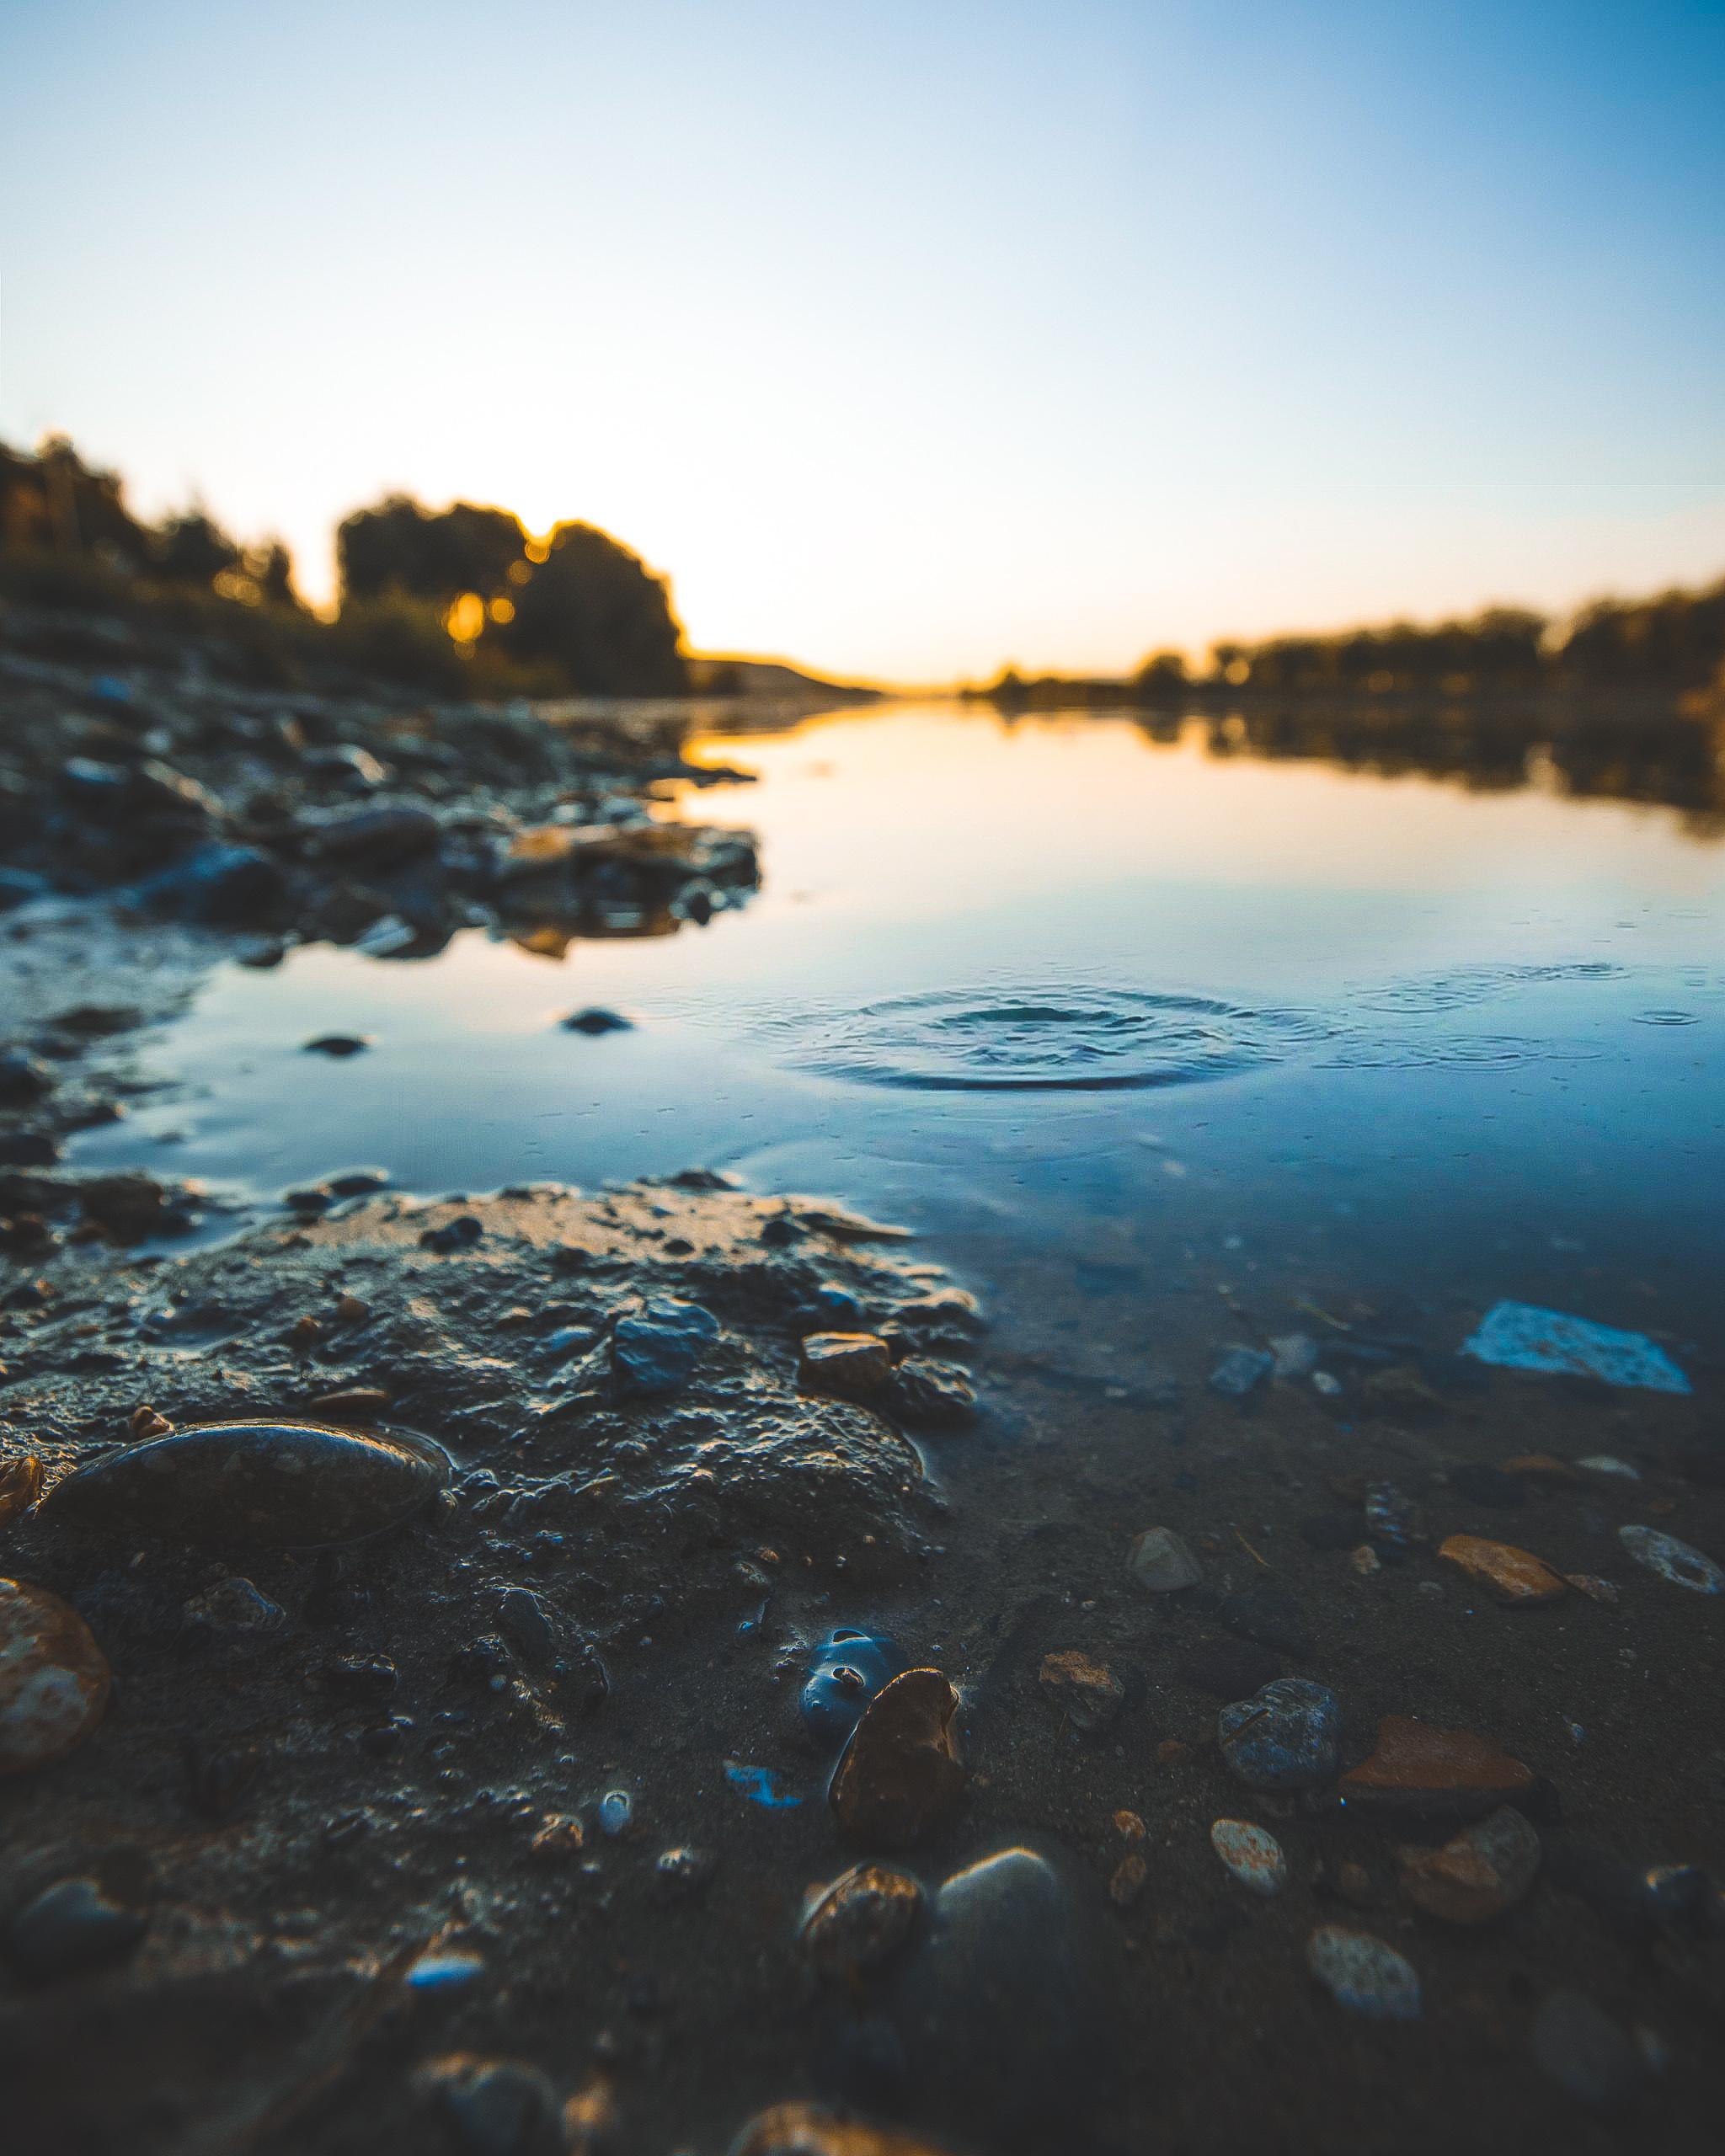 Photo Of Stones In Water